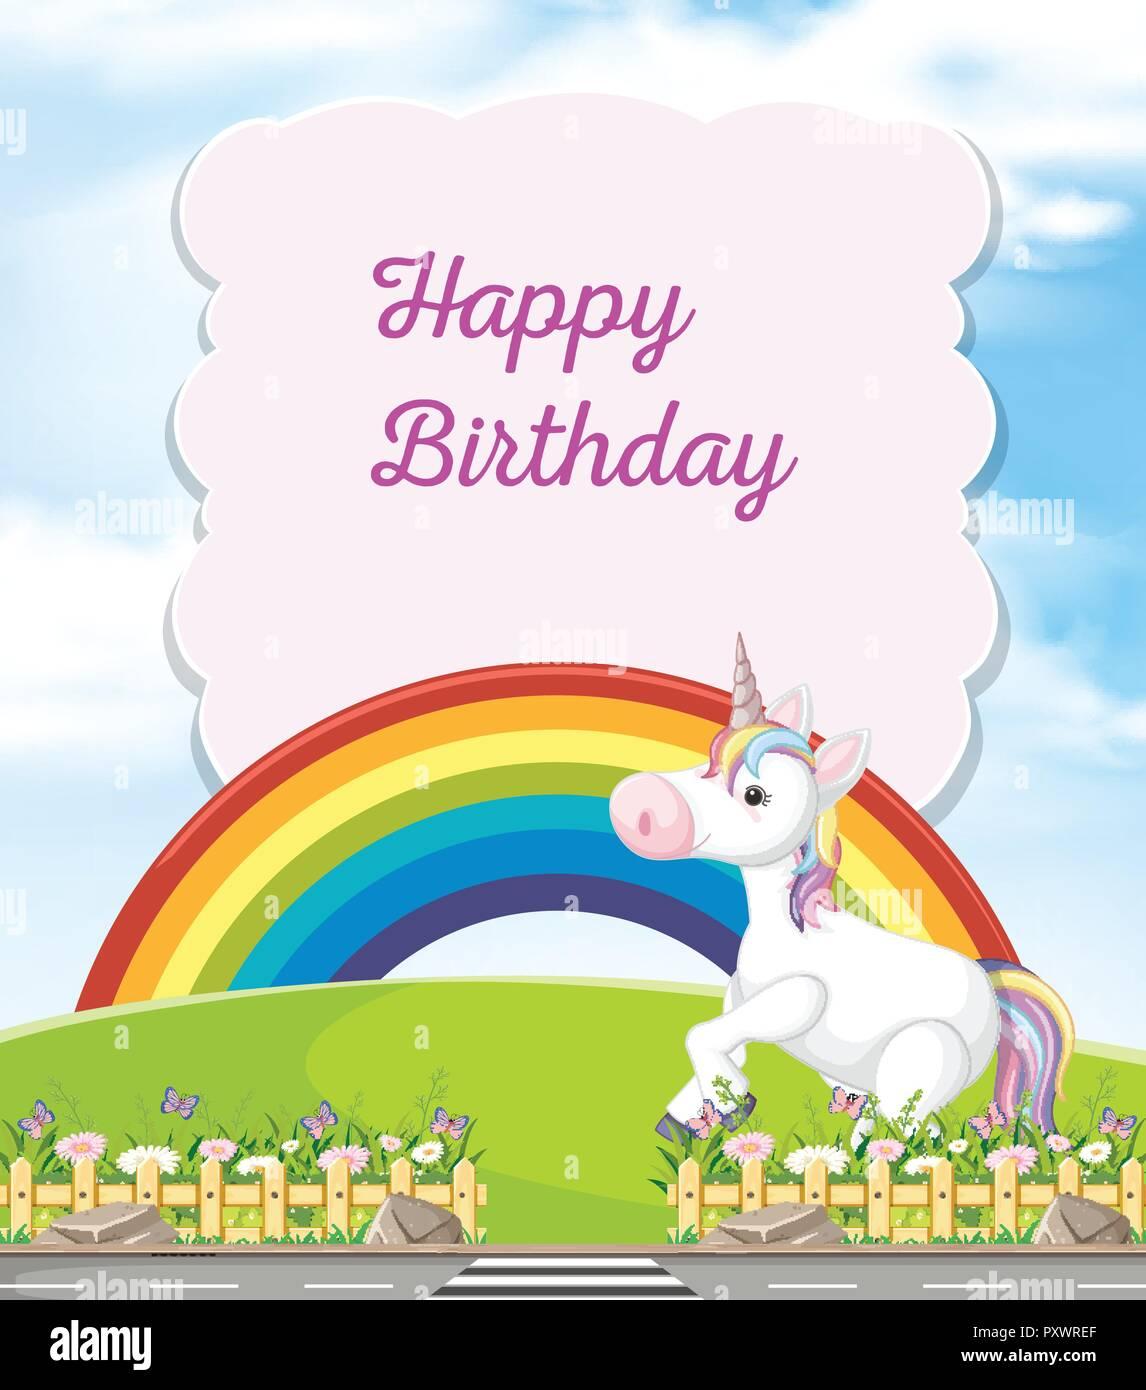 Happy Birthday Card with Unicorn illustration Stock Vector